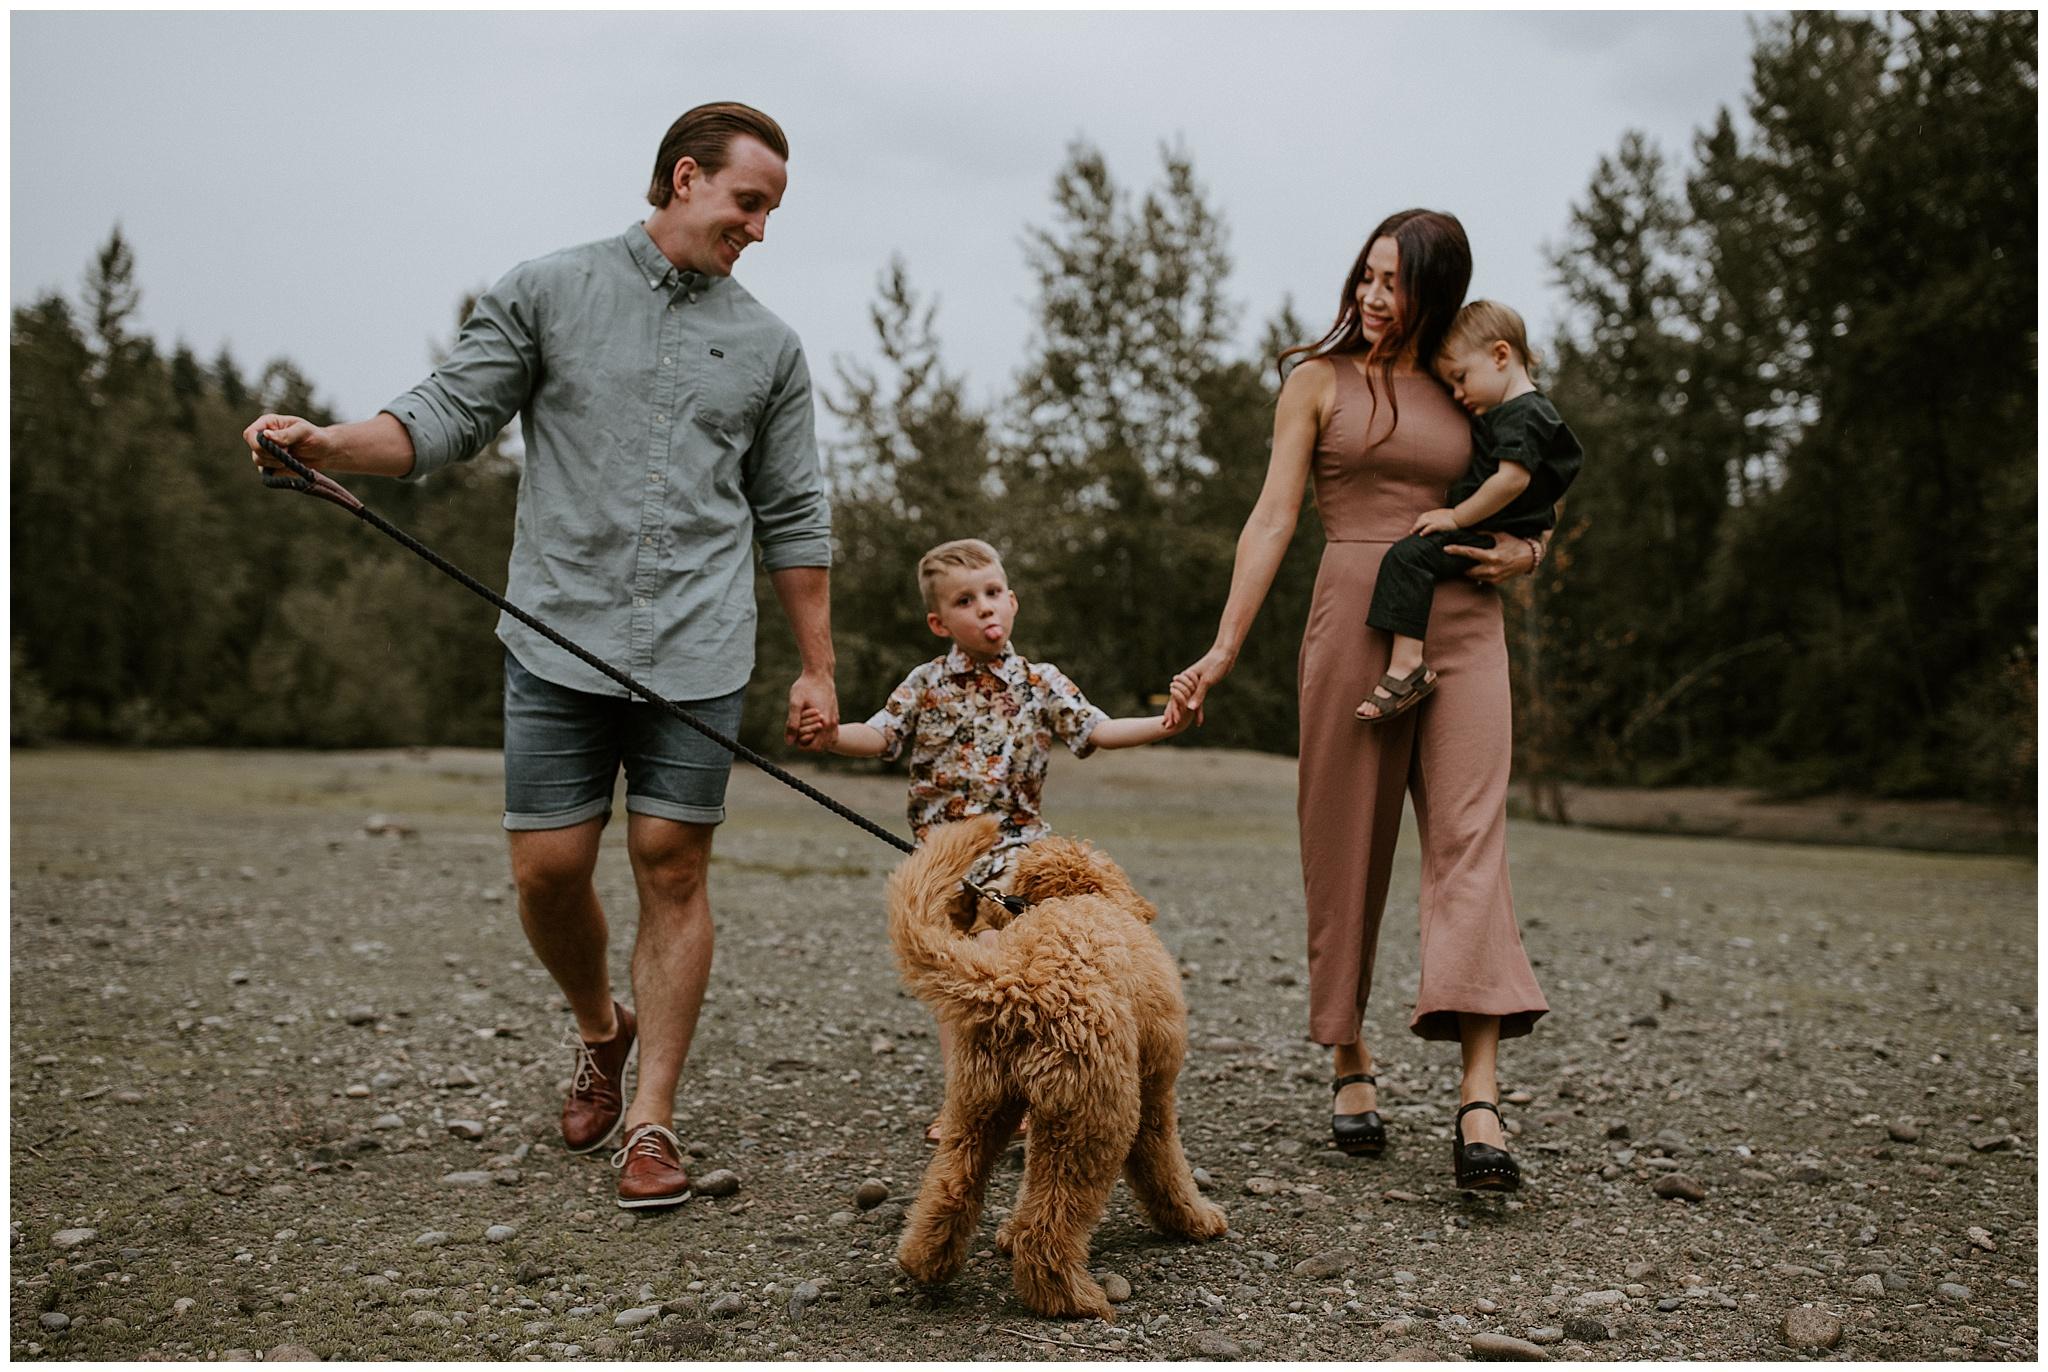 boho_family_session_vancouver_family_photographyer_003.JPG